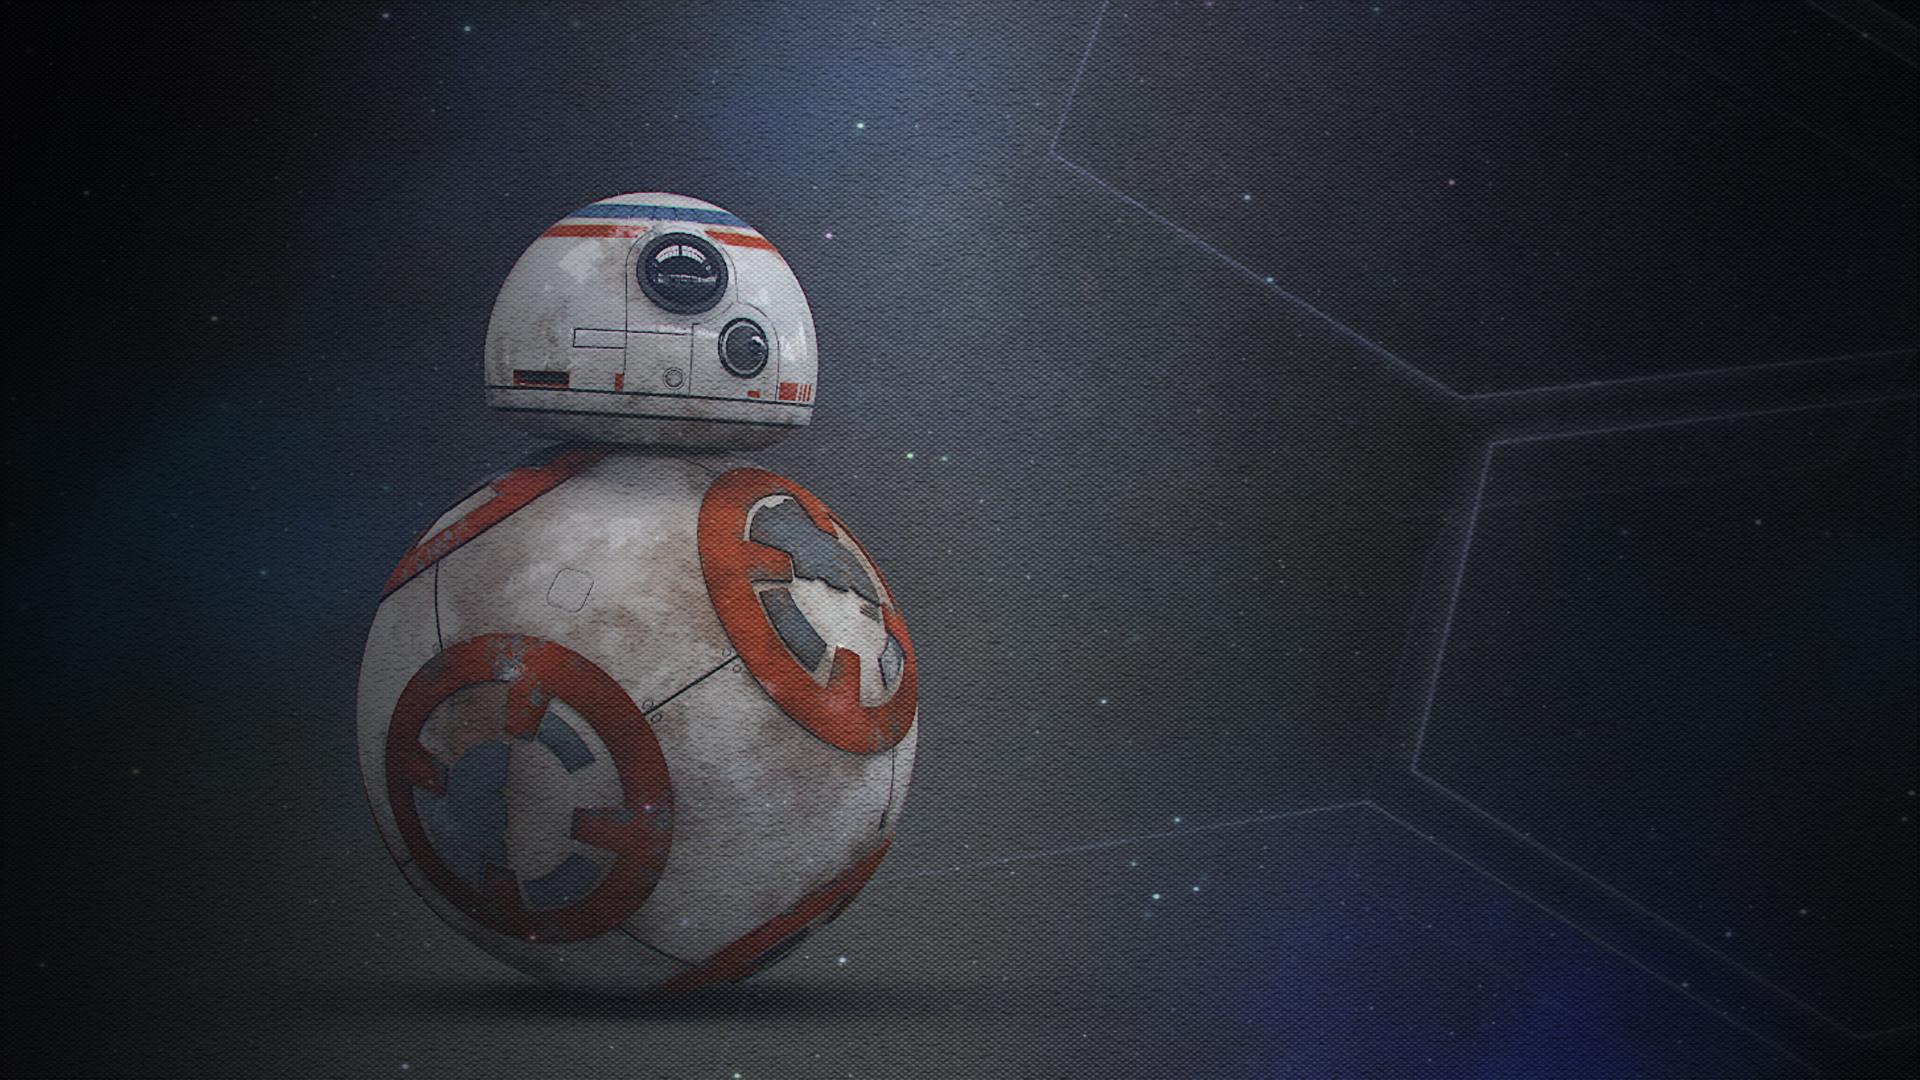 Star Wars BB 8 wallpaper by xsas7 1920x1080